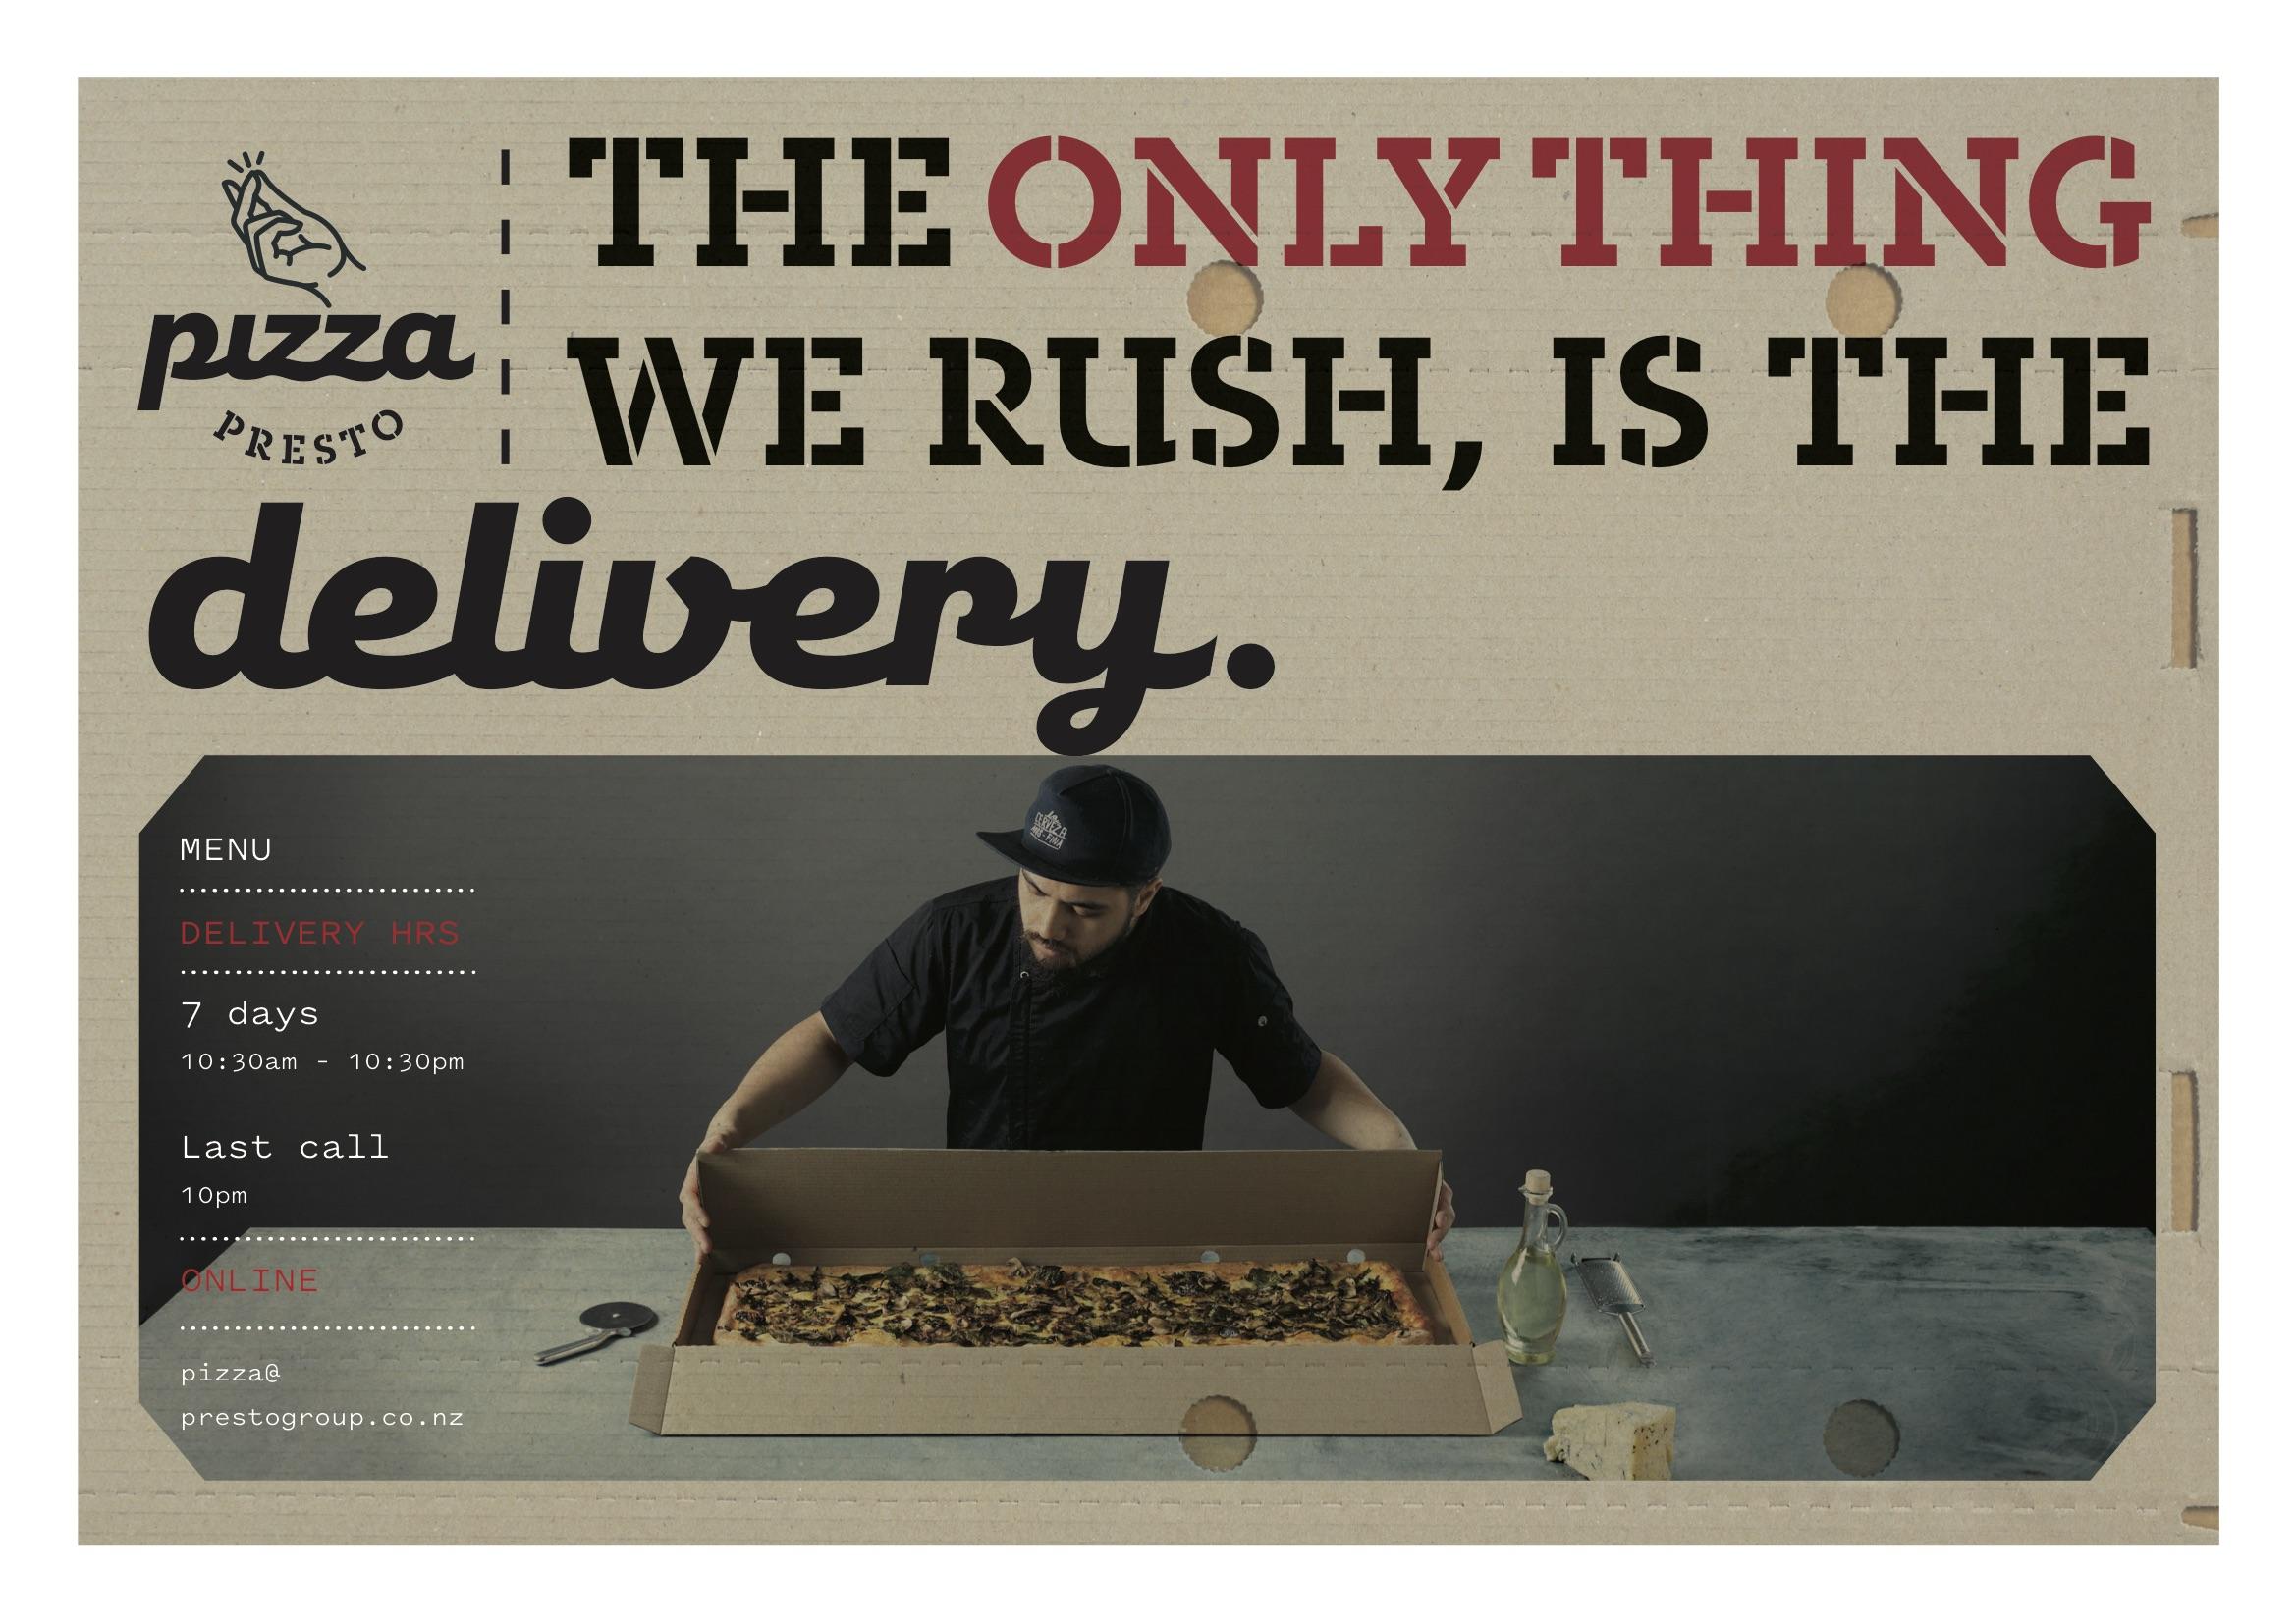 Pizza Presto_Menu_Final.jpg